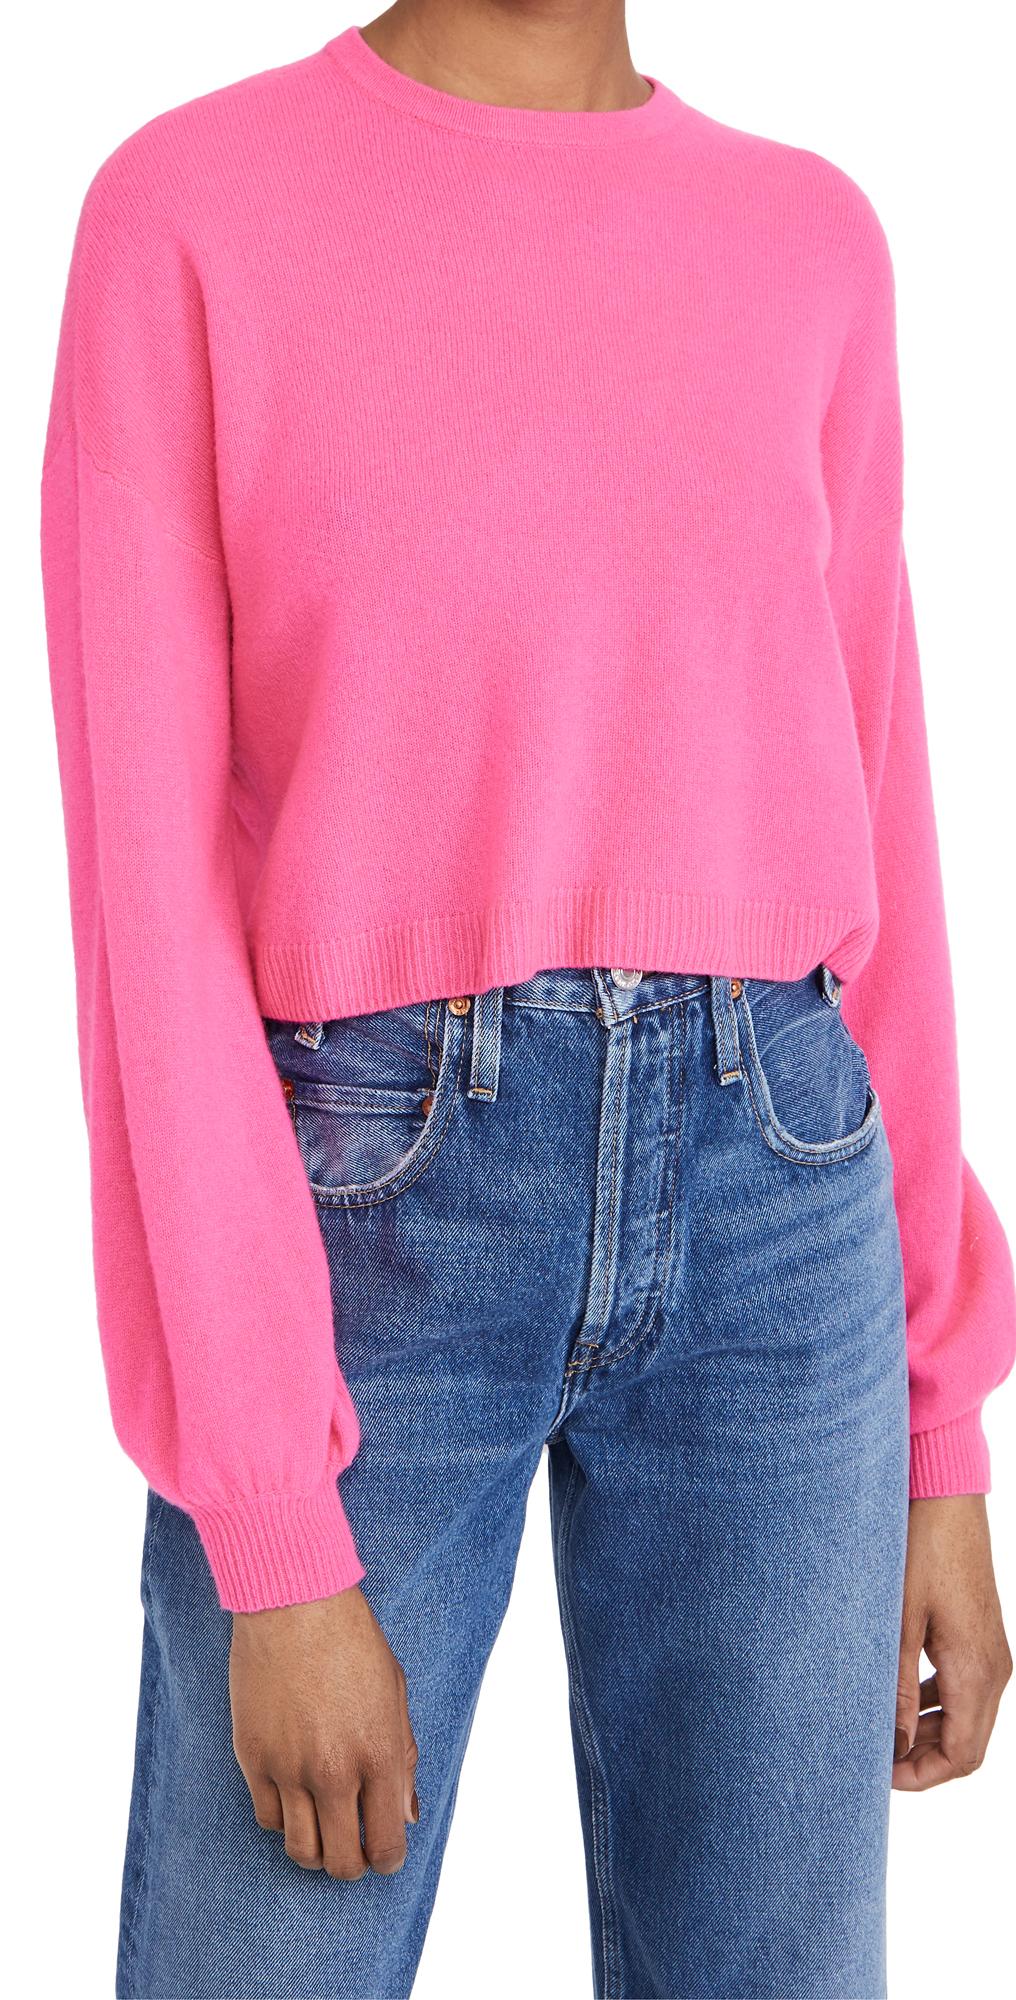 alice + olivia Ansley Cashmere Sweater